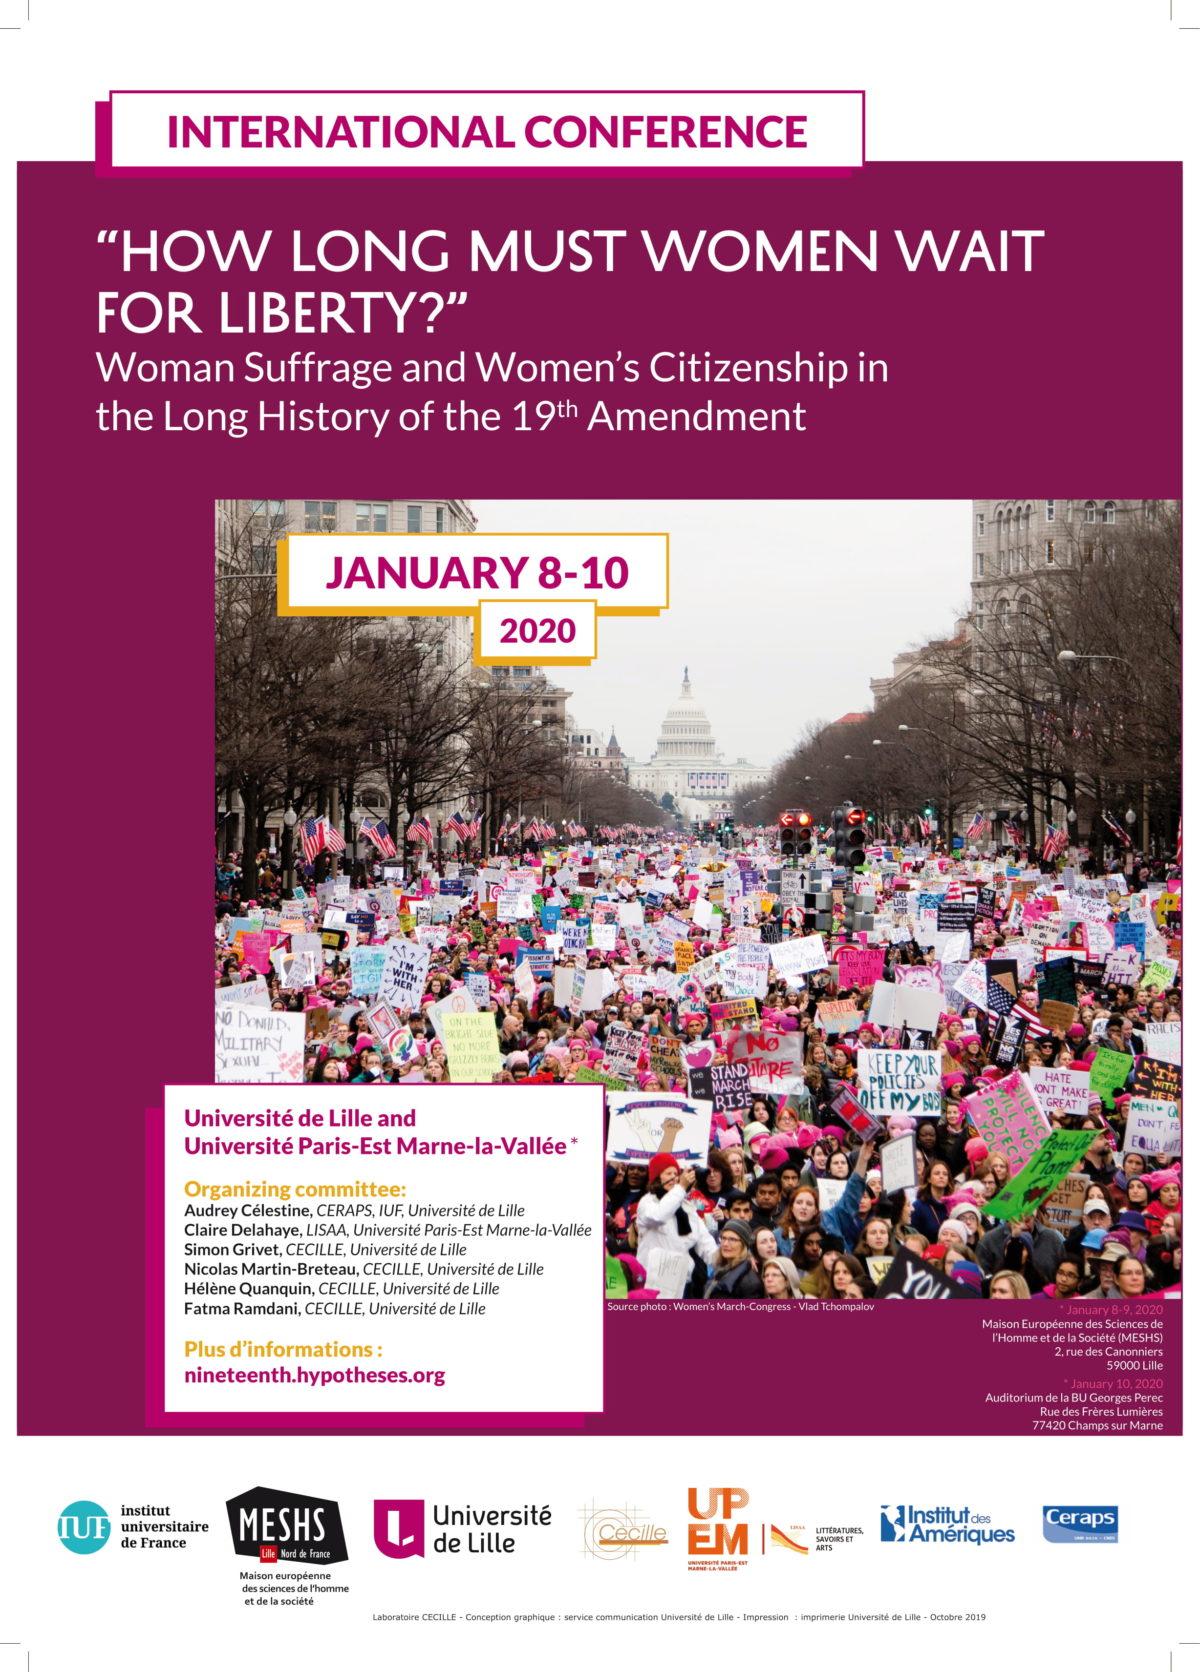 How long must women wait for liberty?